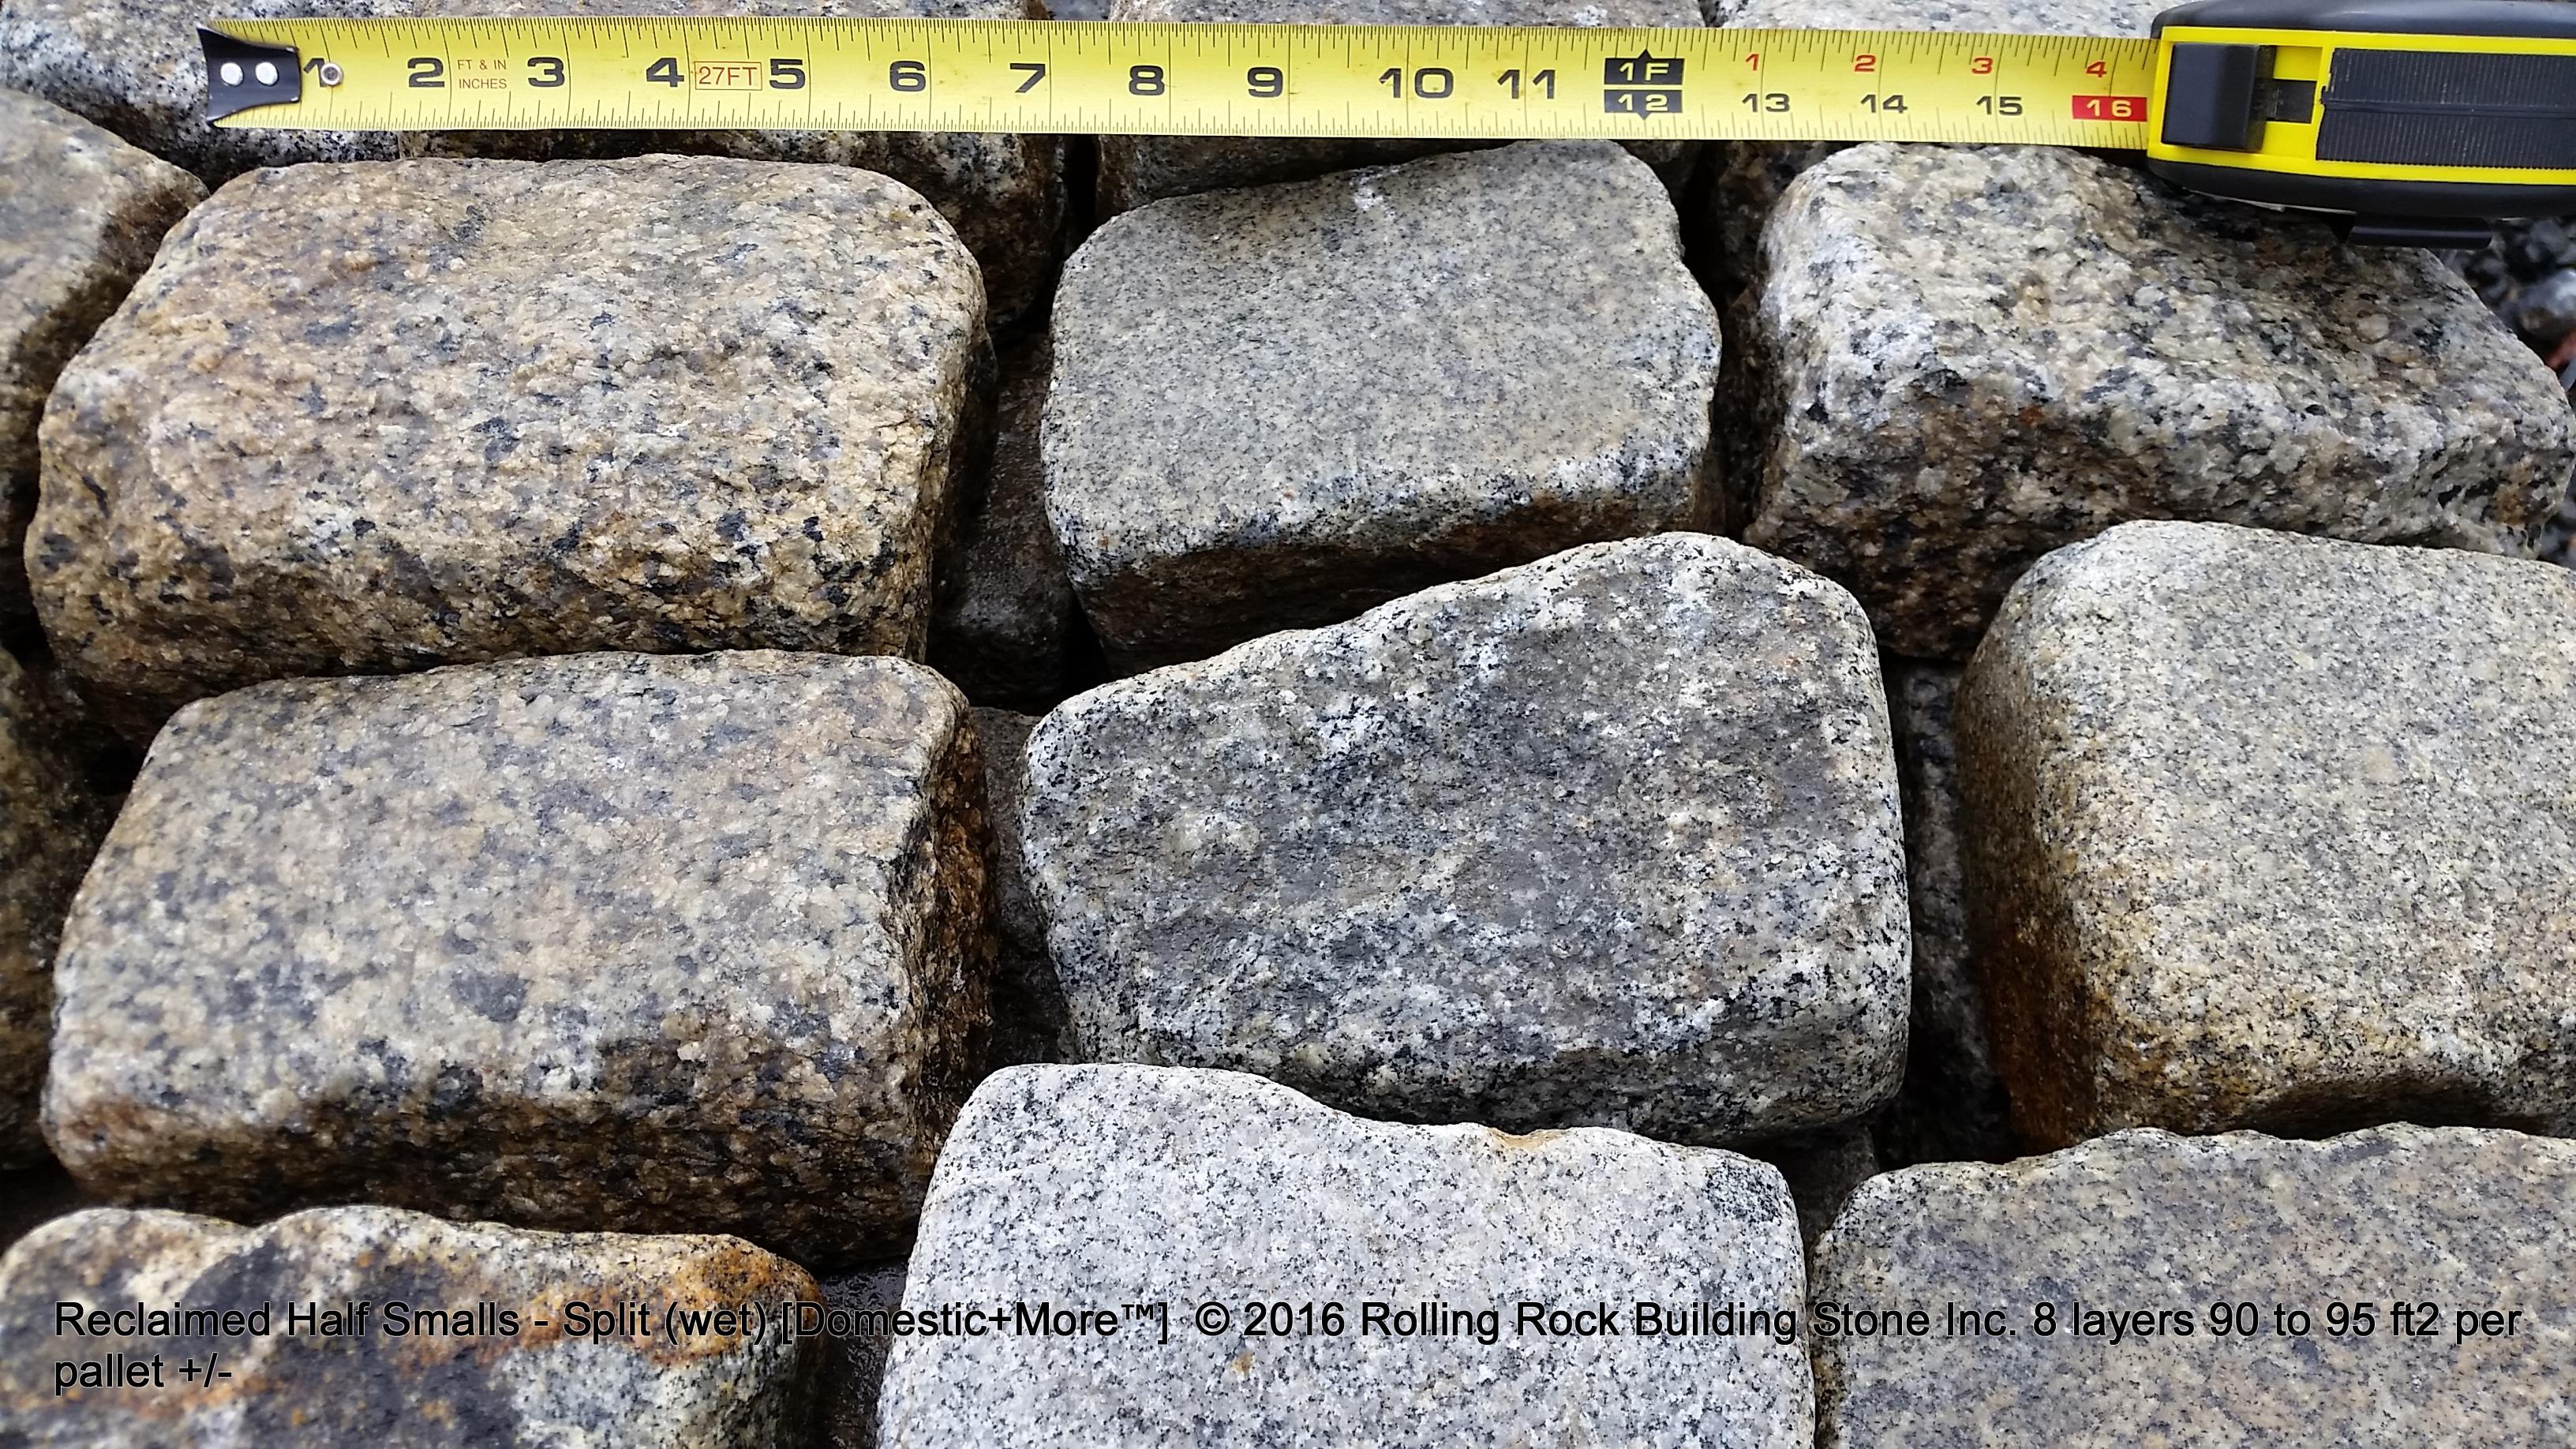 Reclaimed Split Small | Rolling Rock Building Stone, Inc